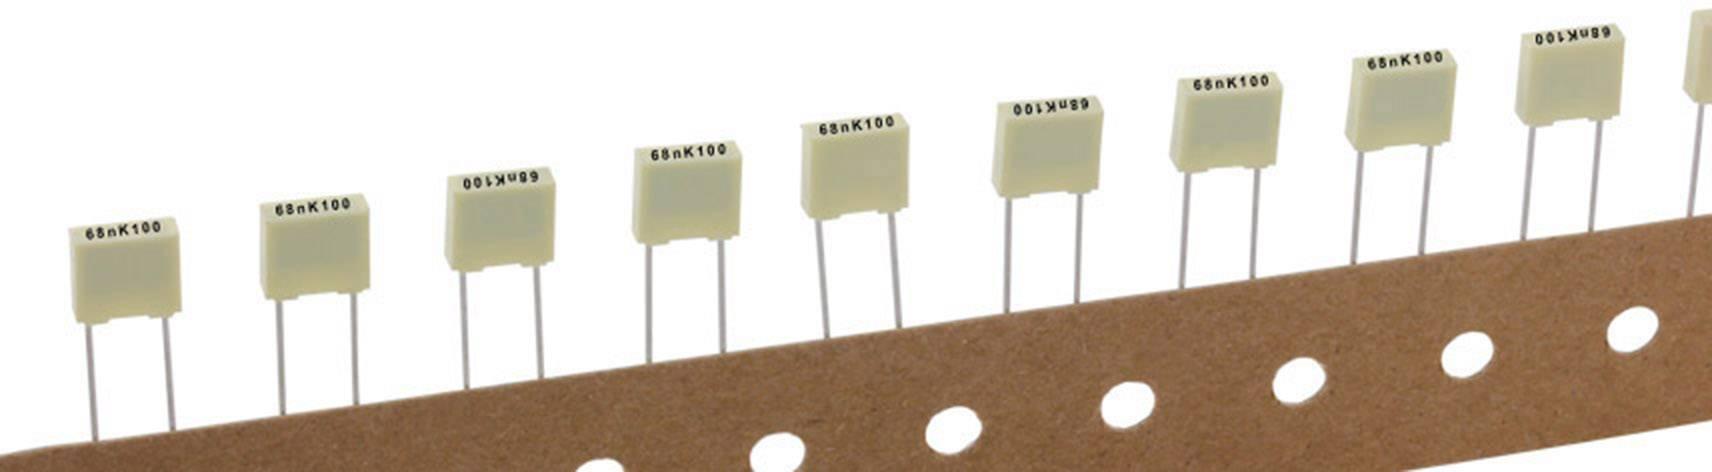 Polyesterový kondenzátor Kemet R82EC1680DQ50K+ radiální, 6.8 nF, 100 V,10 %, 5 mm, (d x š x v) 7.2 x 2.5 mm x 6.5 mm, 1 ks